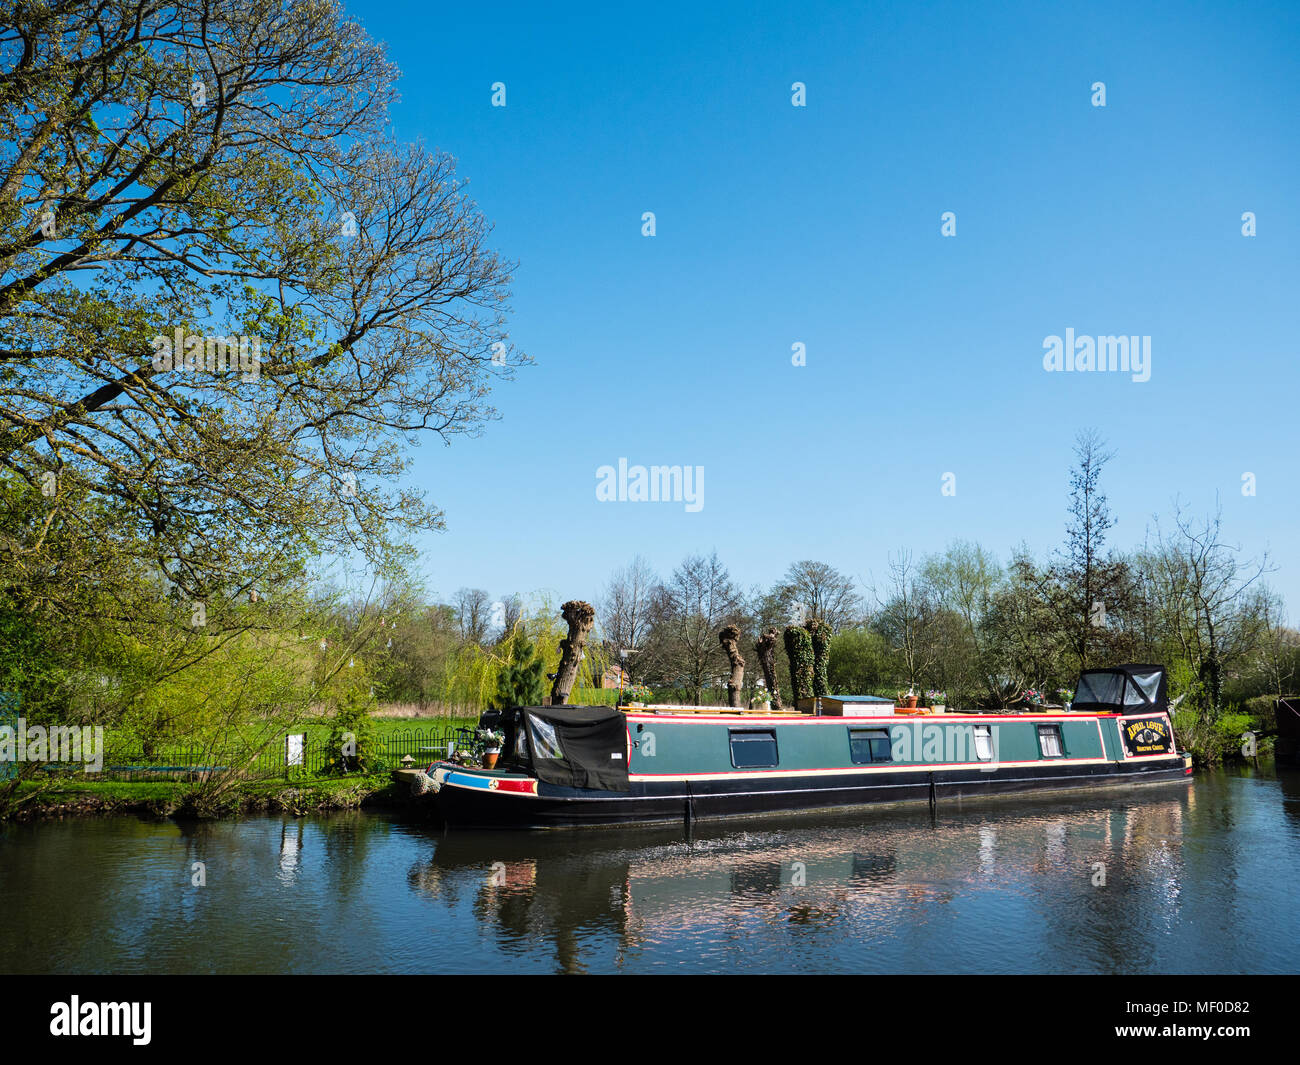 Narrowboat, River Kennet,  Newbury, Berkshire, England, UK, GB. - Stock Image